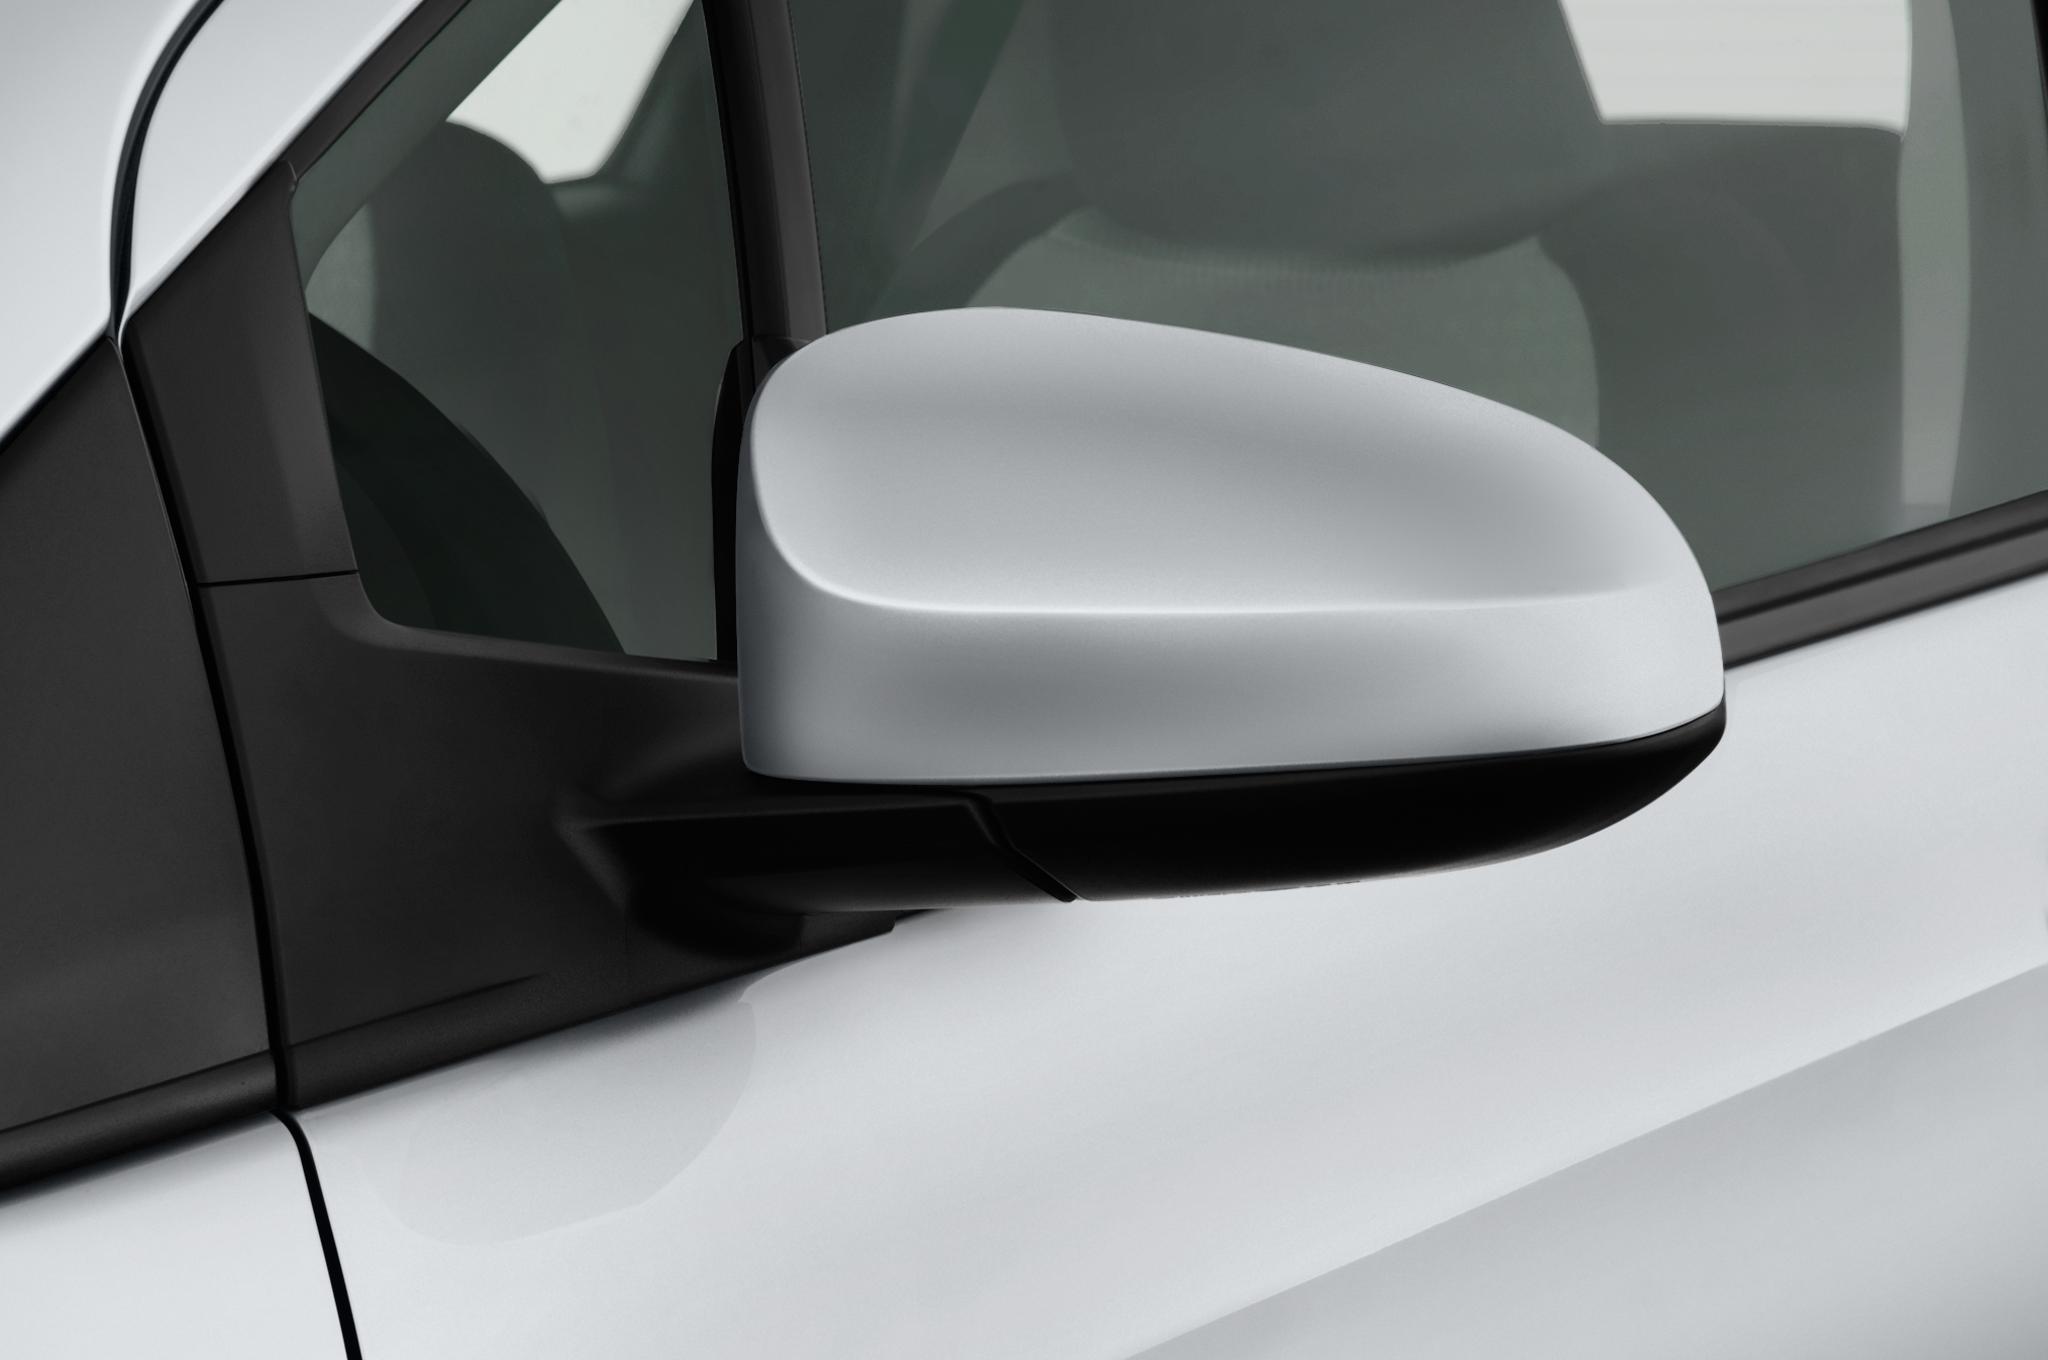 Toyota Shows Customized Tacomas Tundra And 2012 Camry Pace Car At Sema